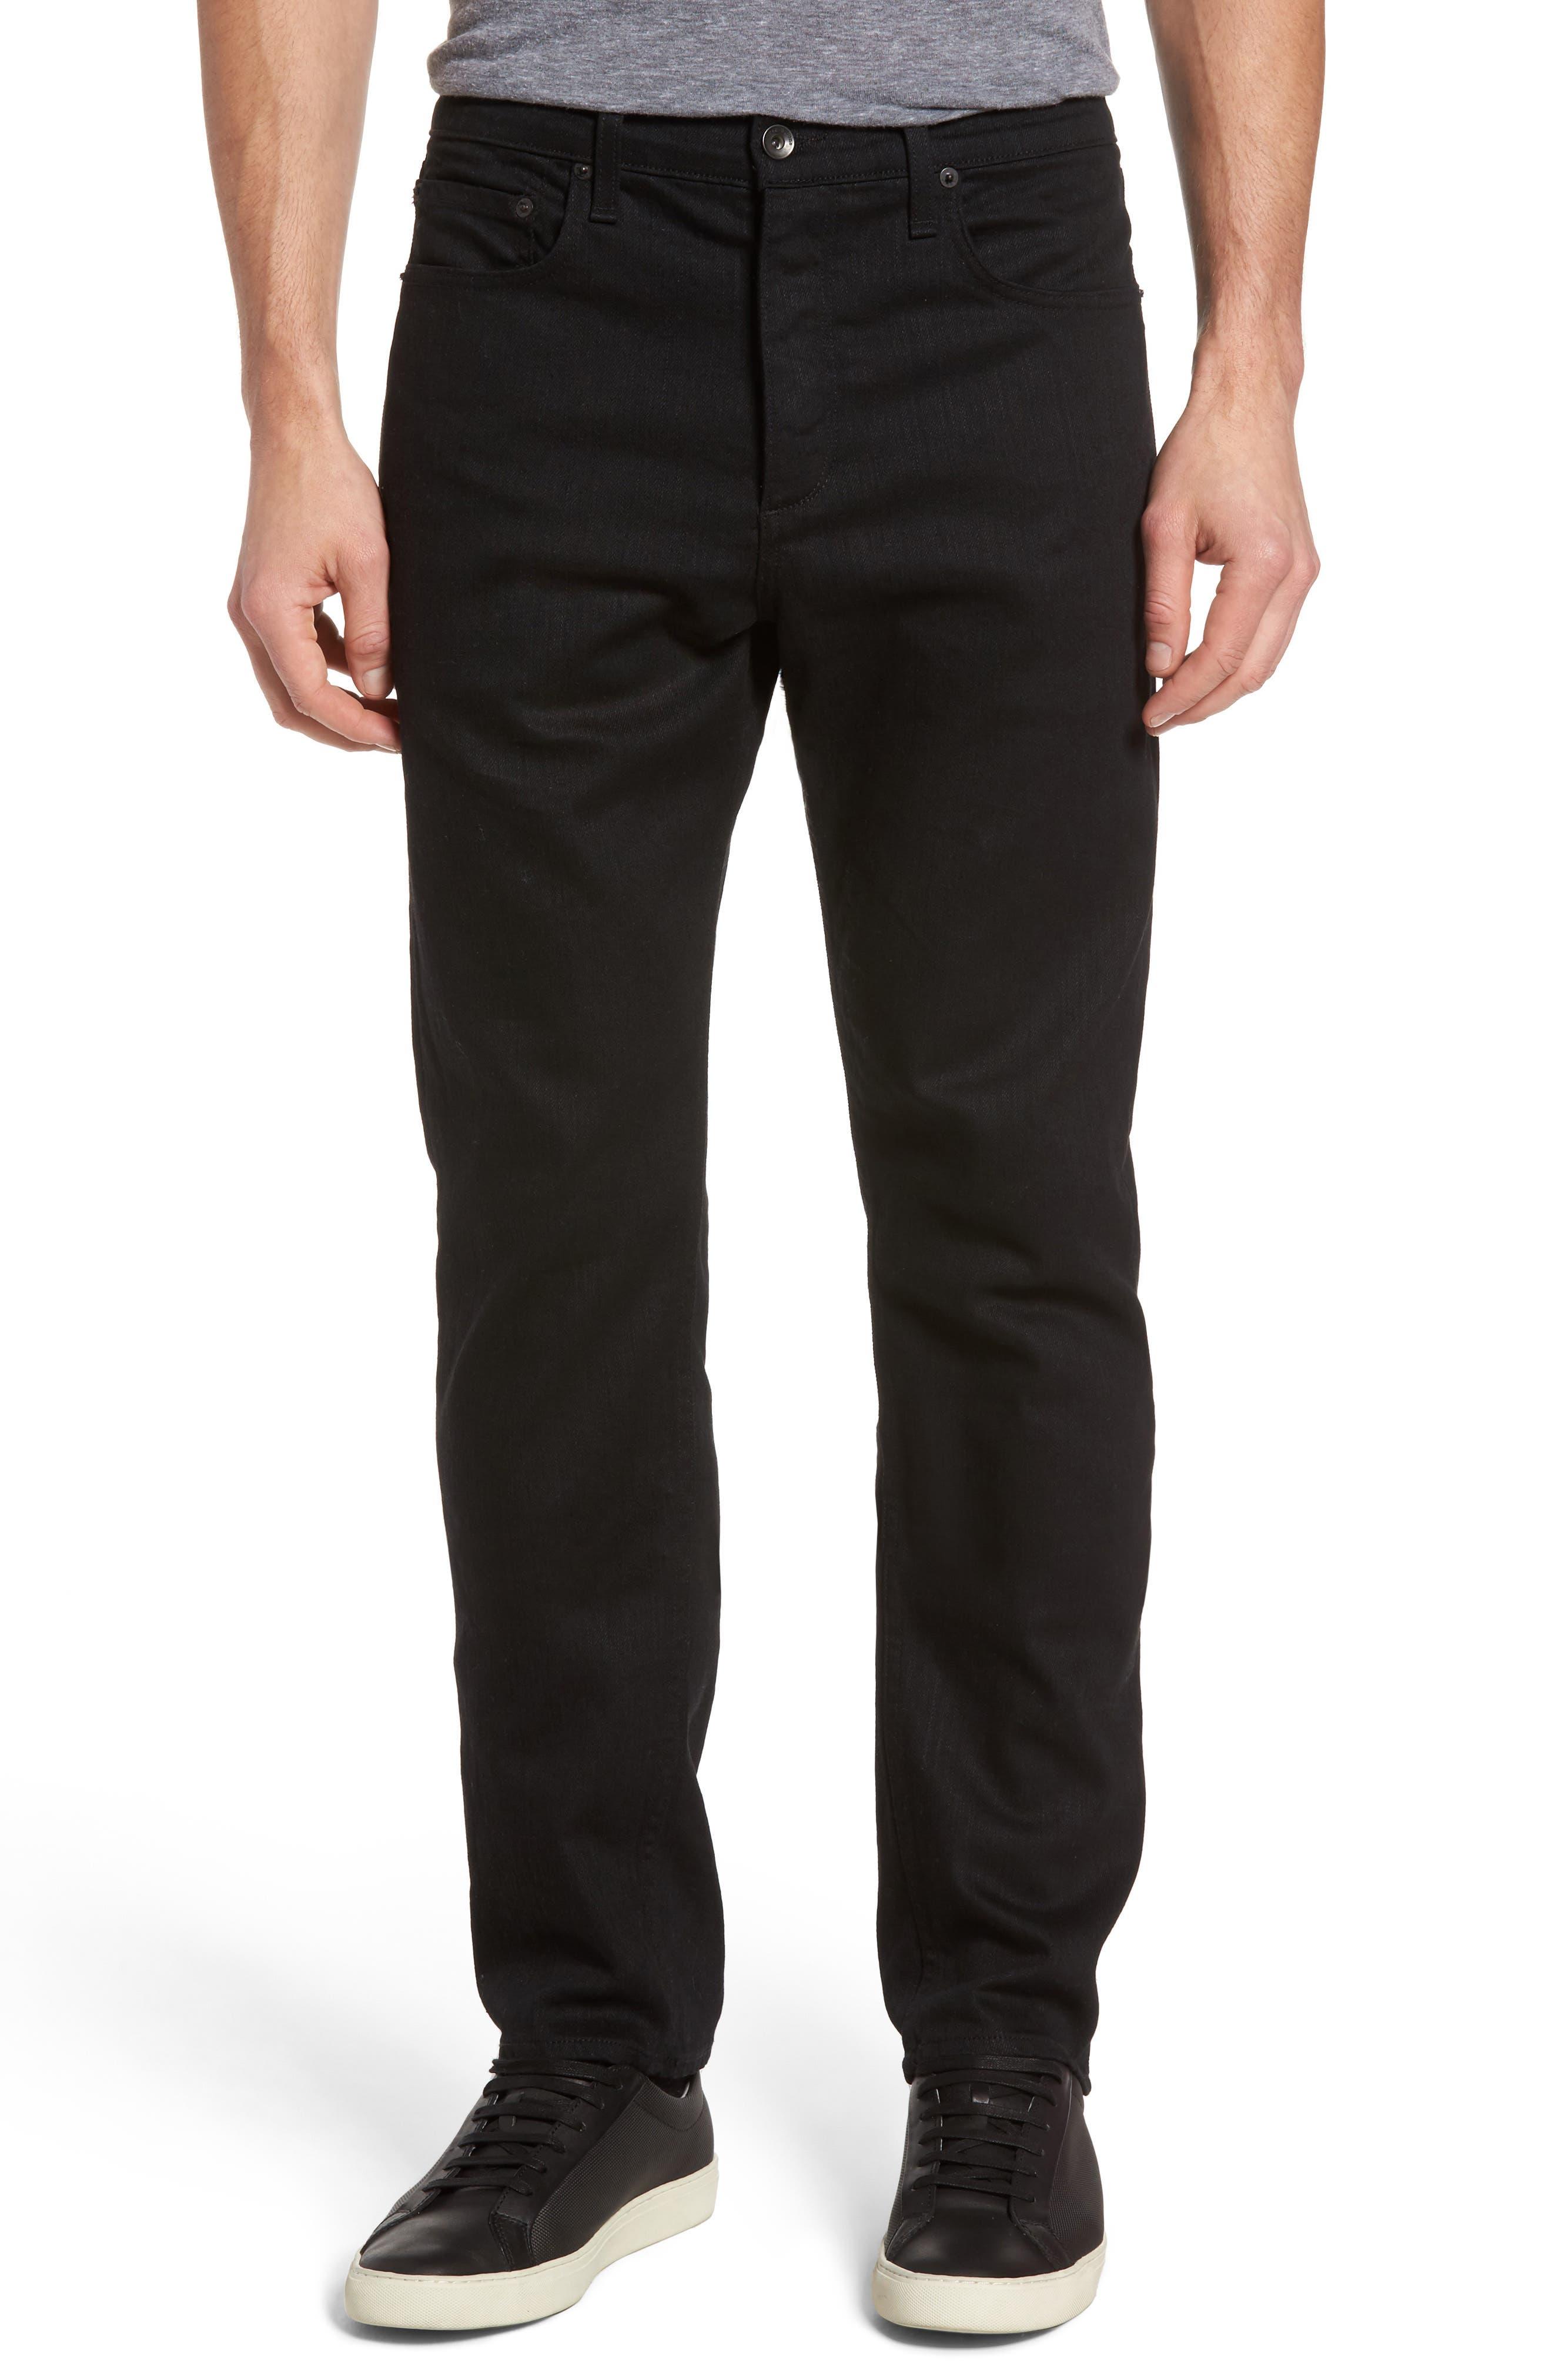 Men's Rag & Bone Fit 3 Slim Straight Leg Jeans